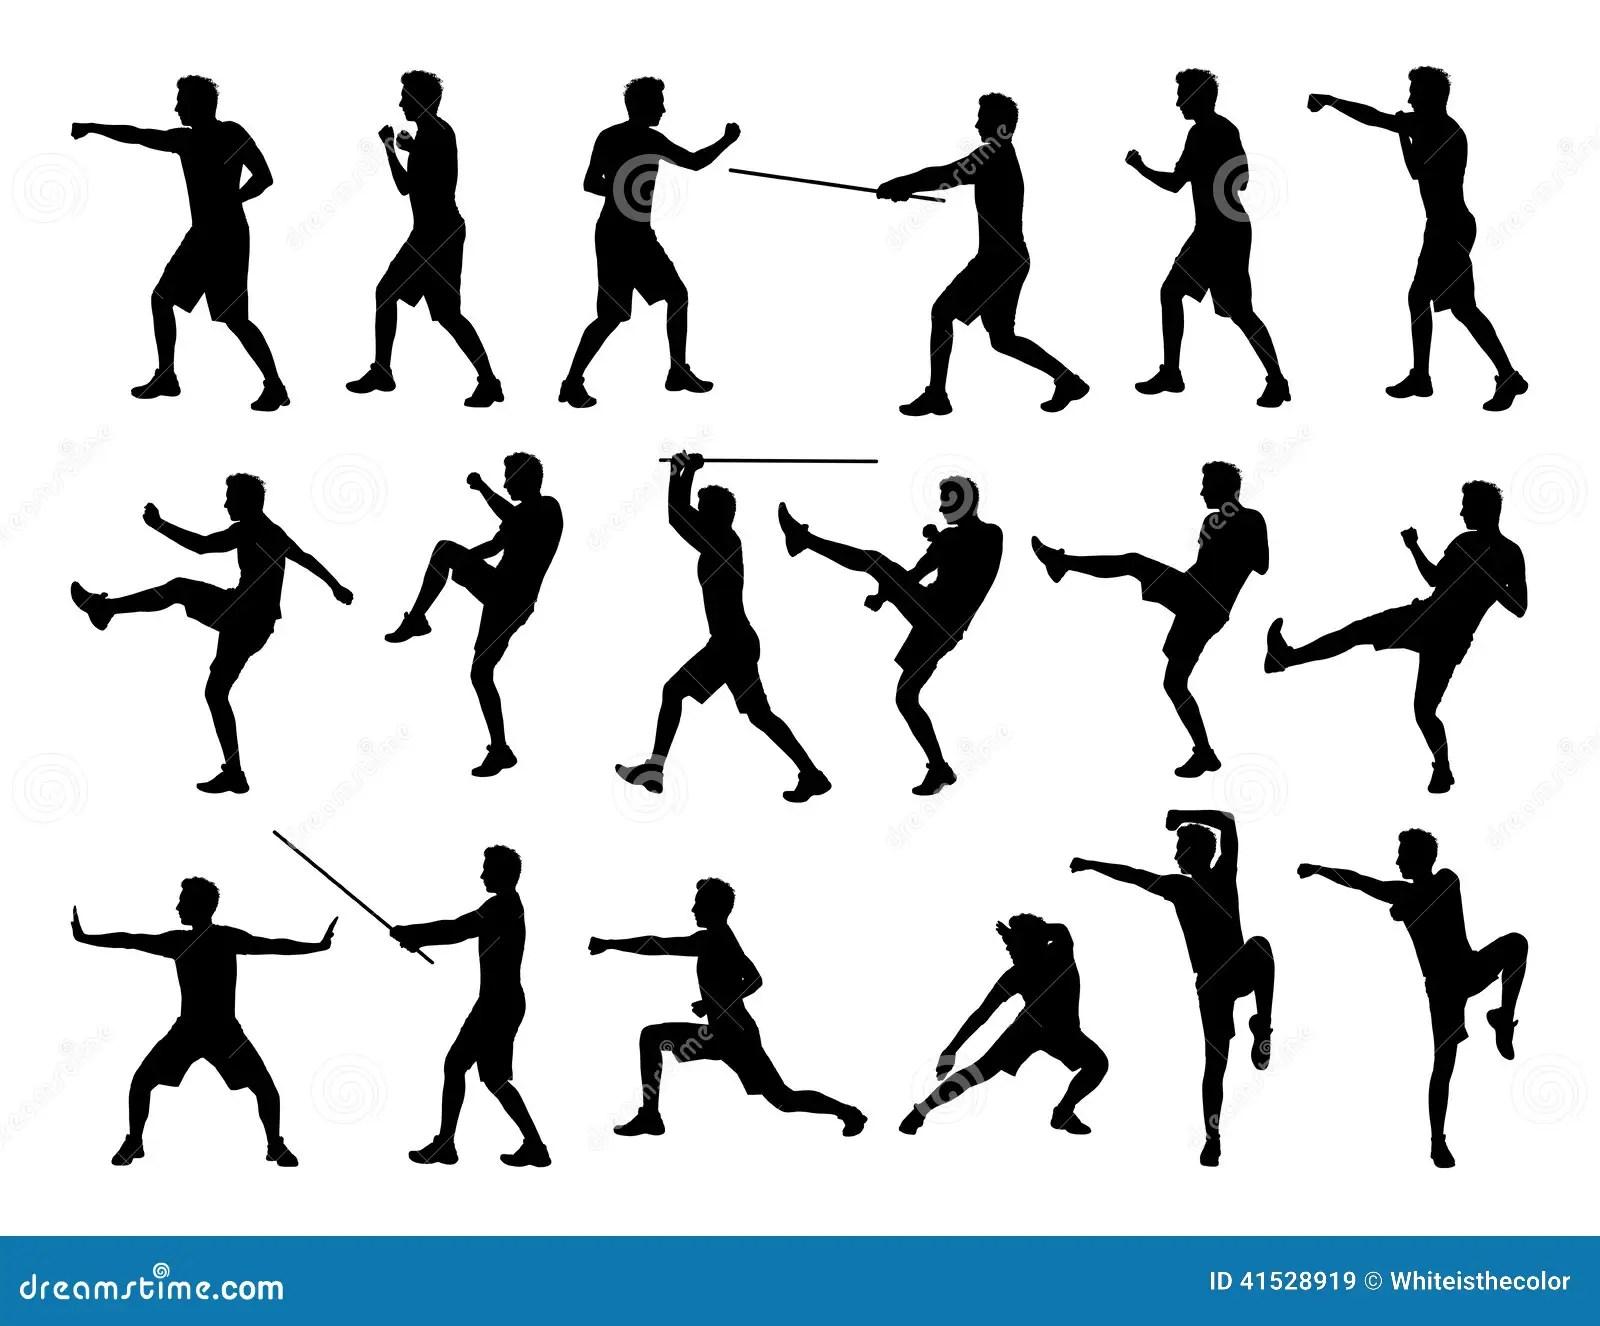 Tai Chi Short Form Postures